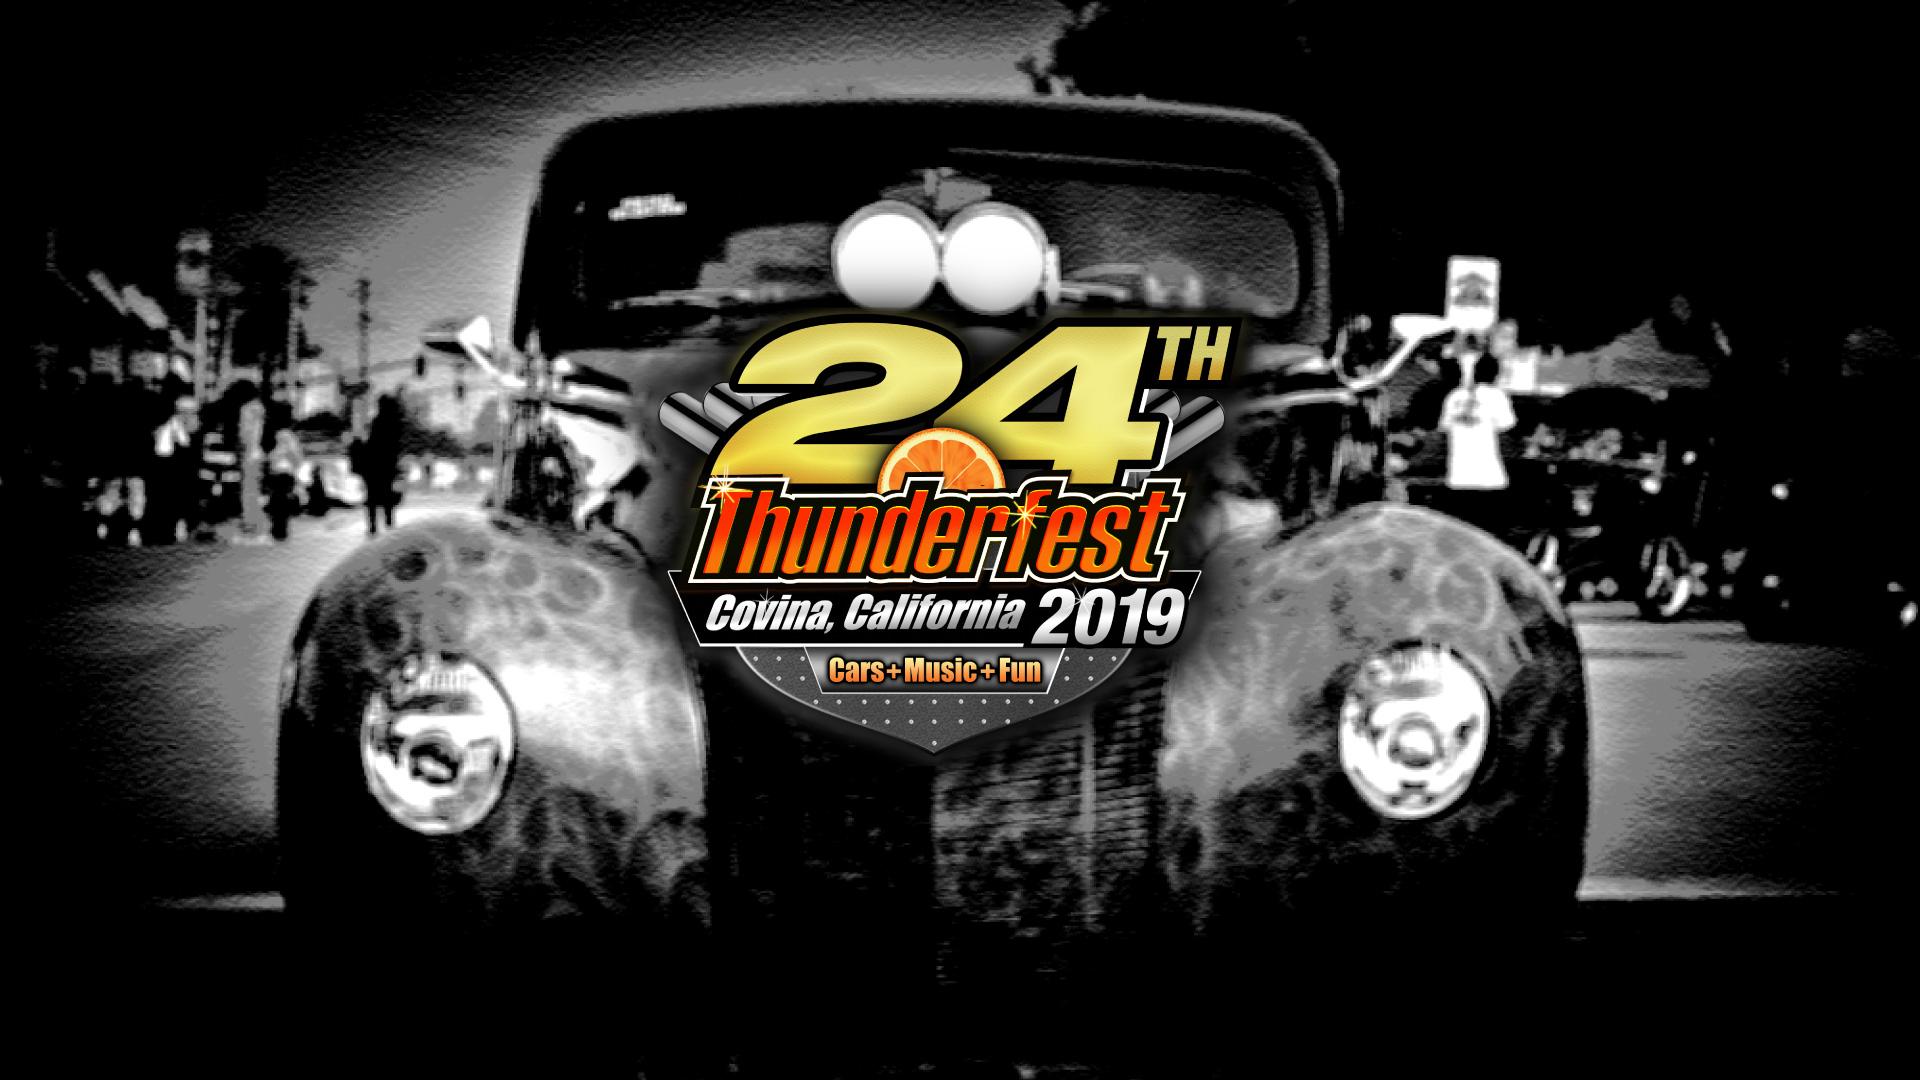 2019-THUNDERFEST-FB-EVENT-HDR-1920x1080-v1